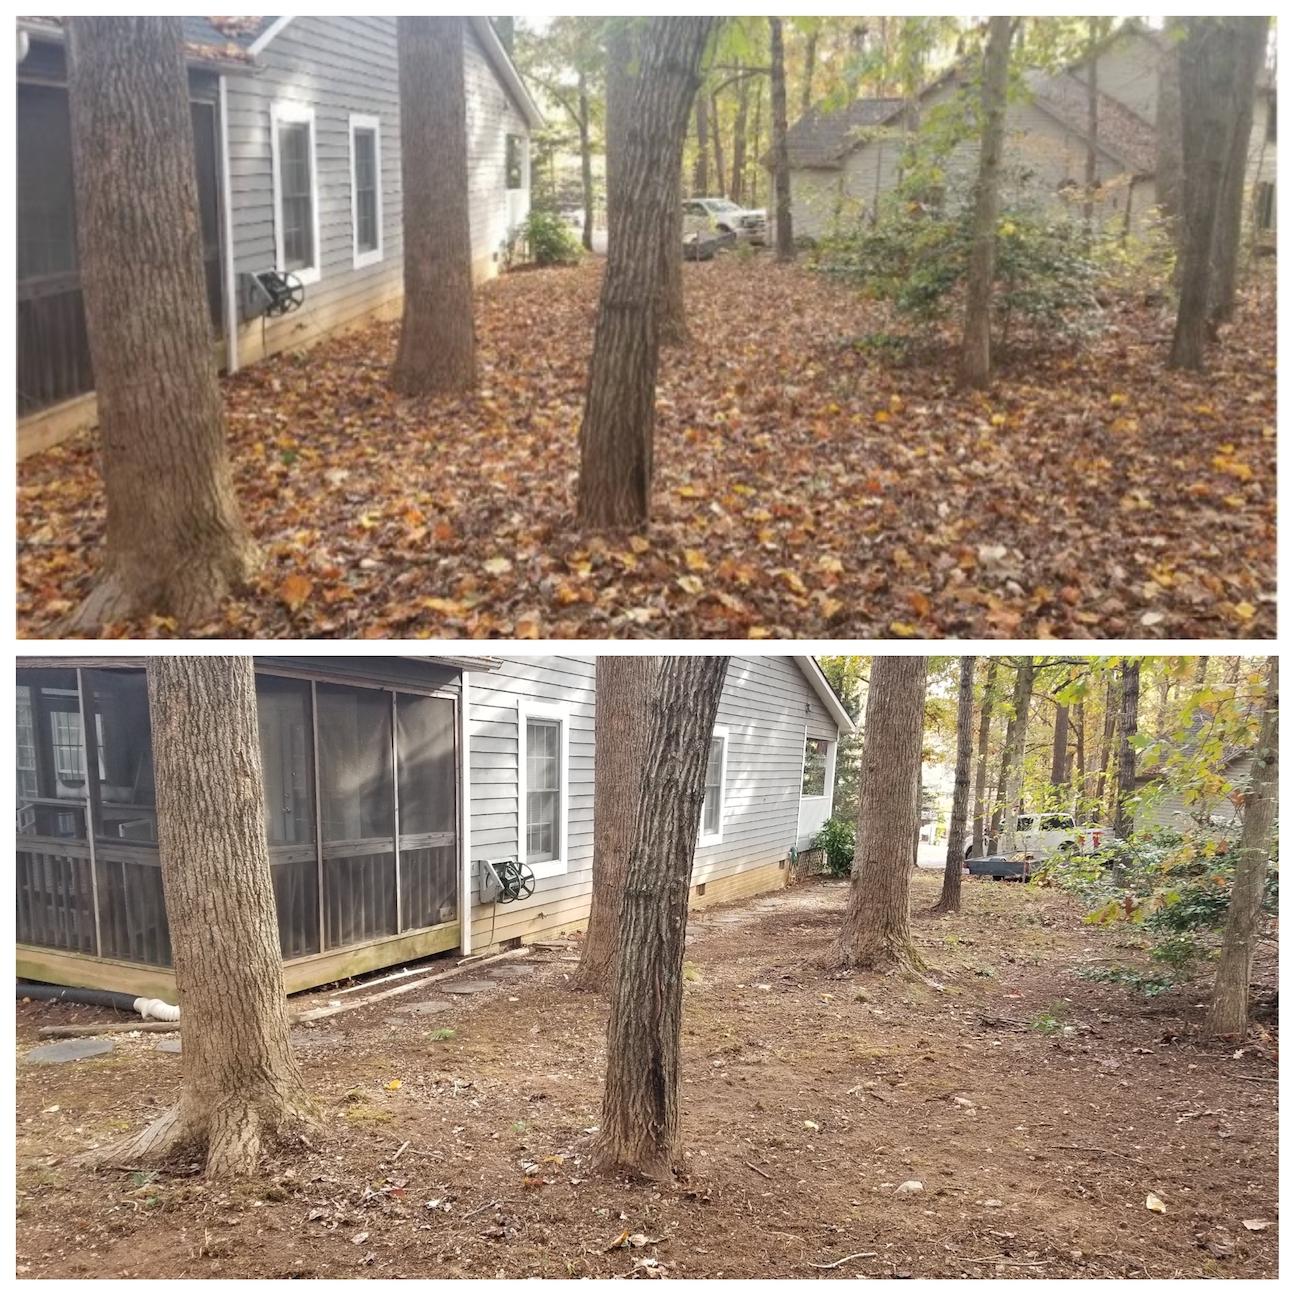 Leaf Cleanup, Fall Cleanup, Leaf Pickup, Leaf Vacuum, Haul Leaves